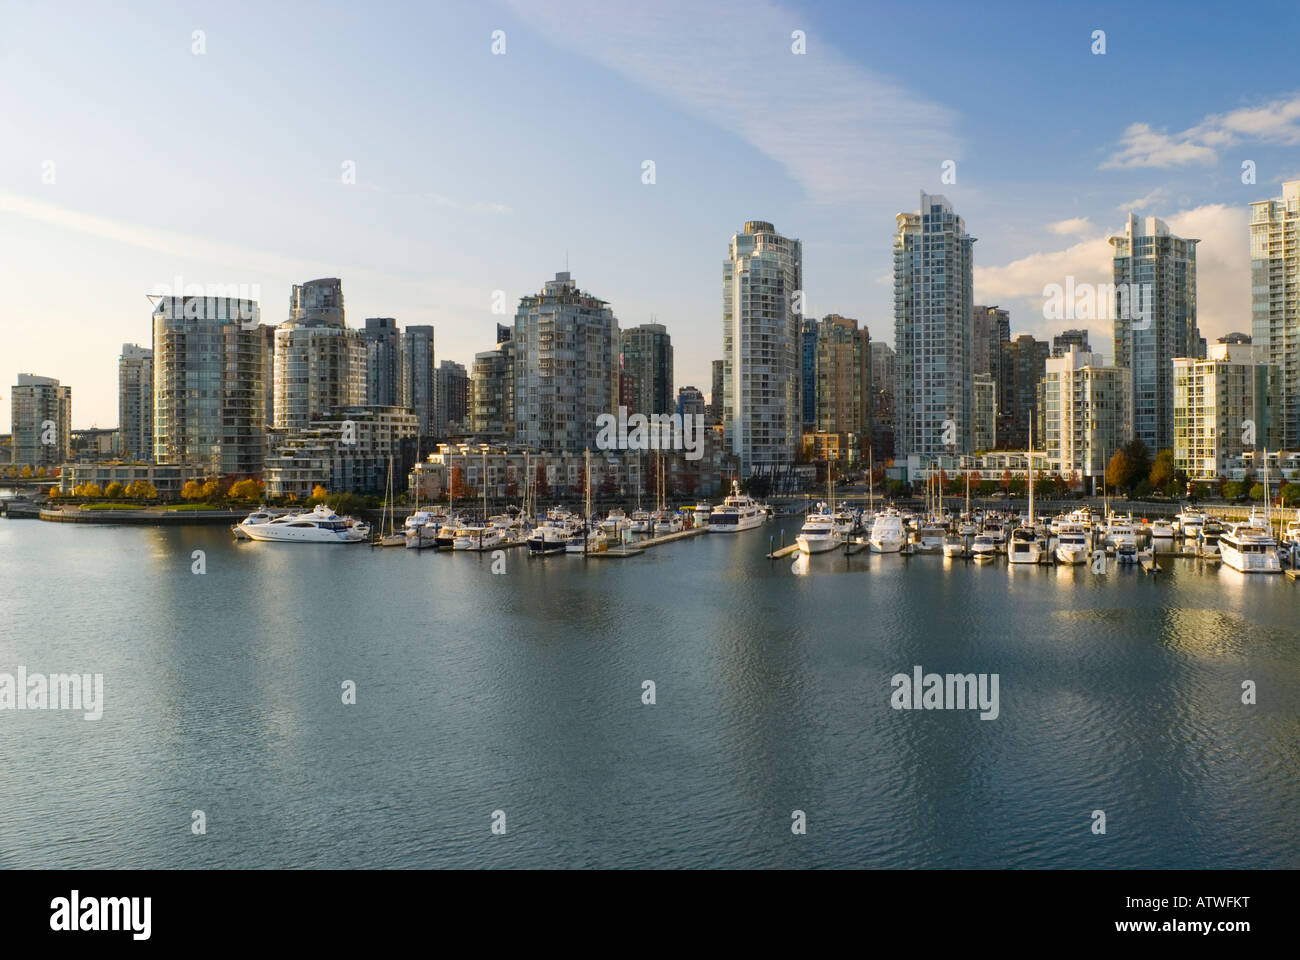 Yaletown Skyline at False Creek Vancouver British Columbia Canada 2007 - Stock Image